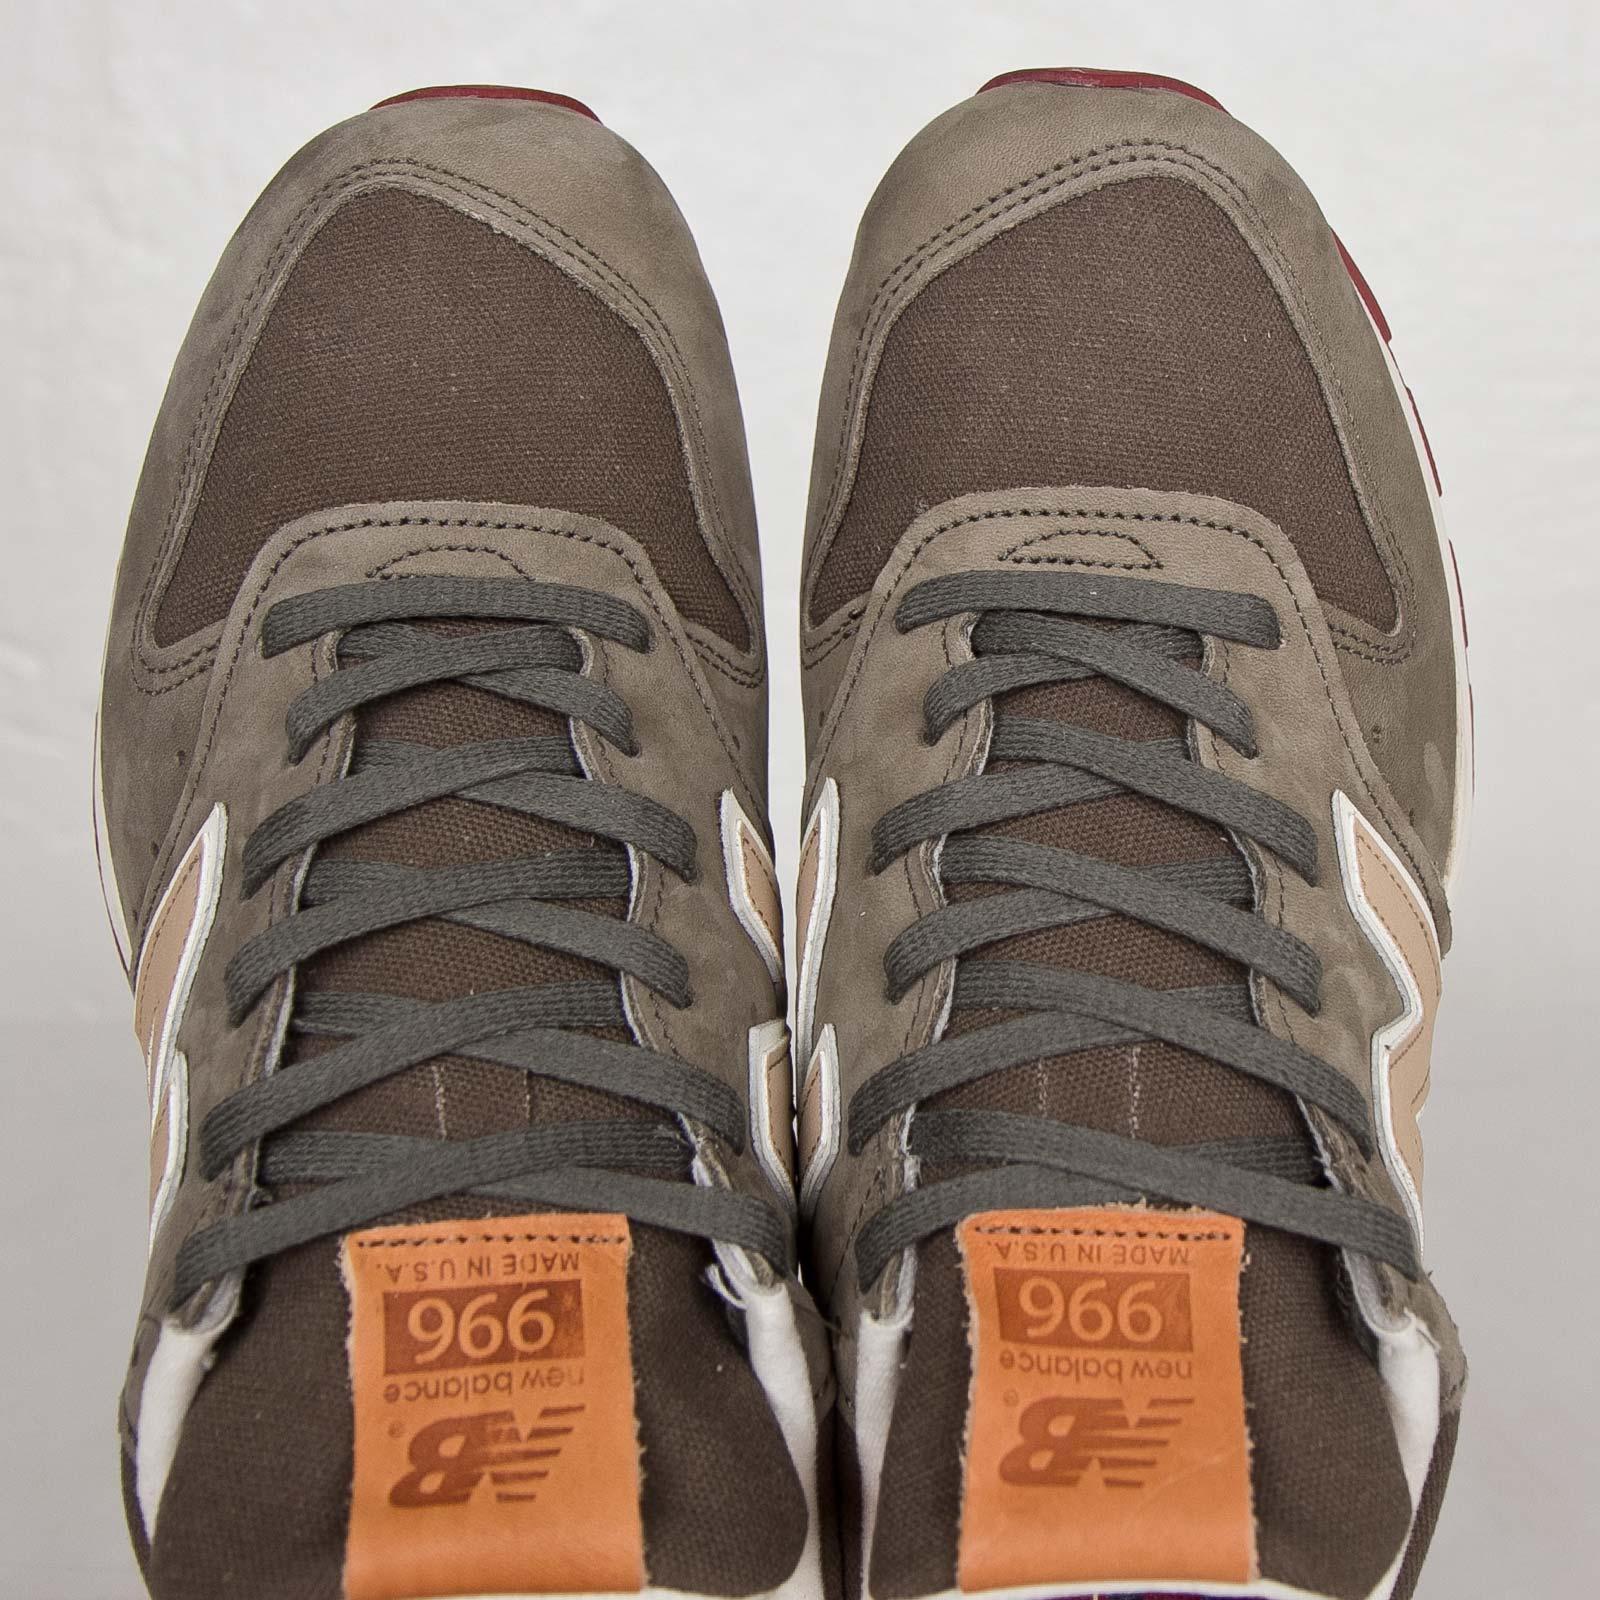 New Balance M996 - M996dol - SNS   sneakers & streetwear online ...